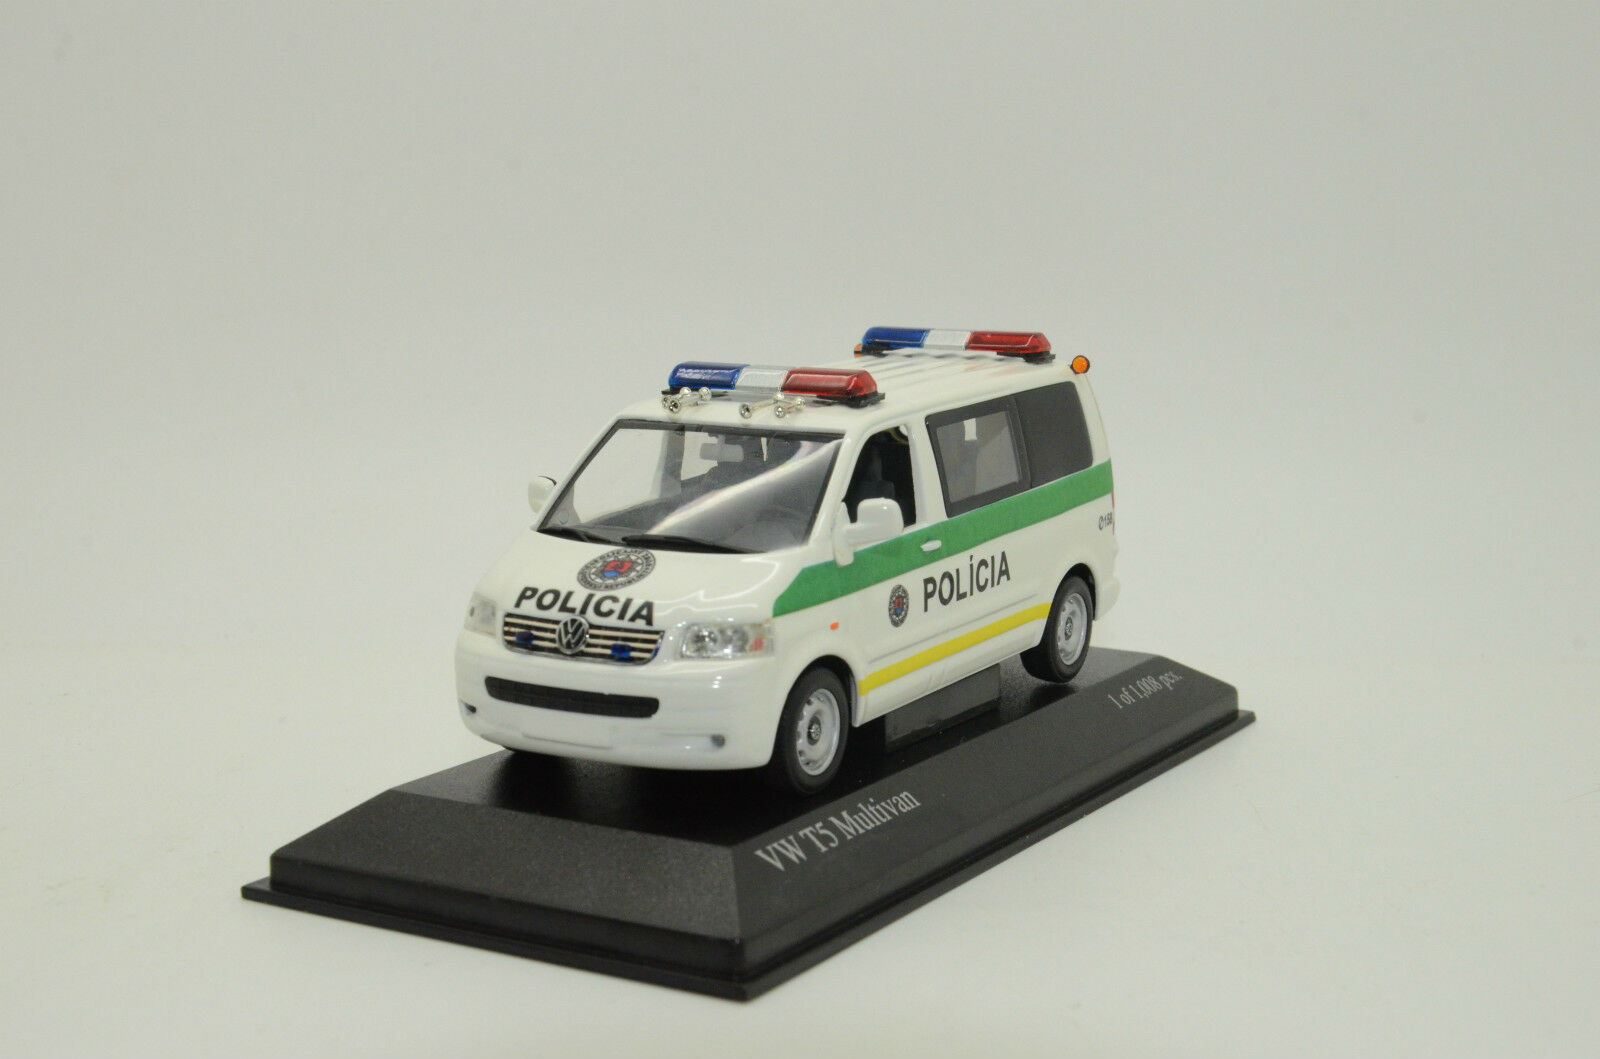 Rara VW T5 Multivan Eslovaquia Policial Policia Hecho a Medida 1 43